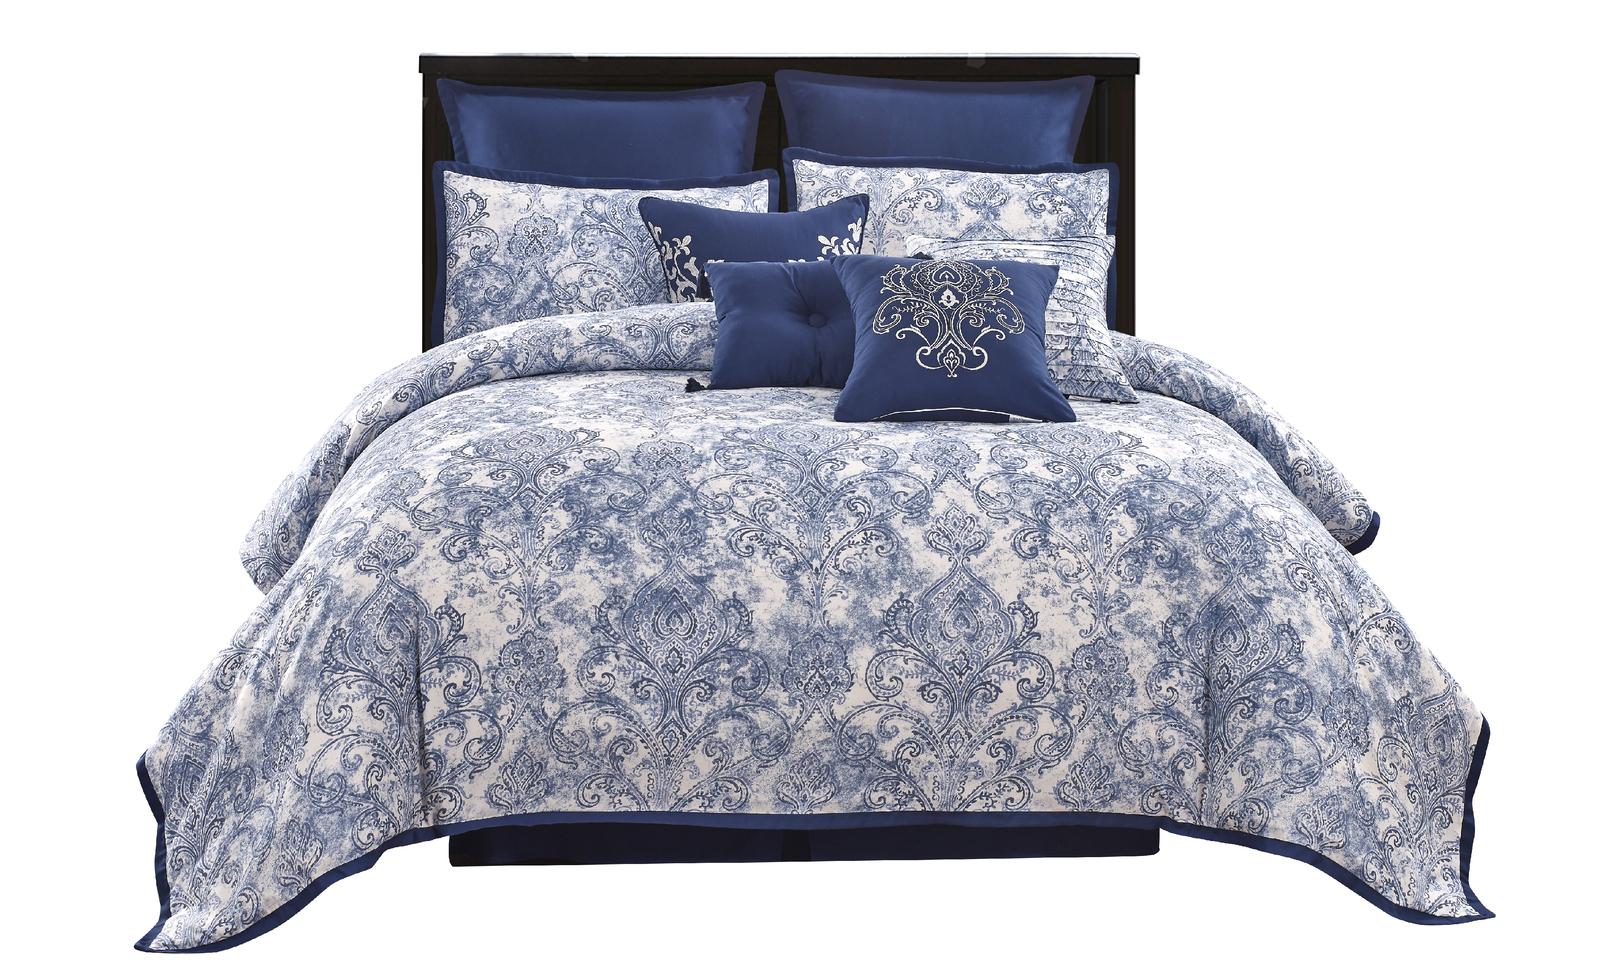 Celeste blue comforter front 4200x2520